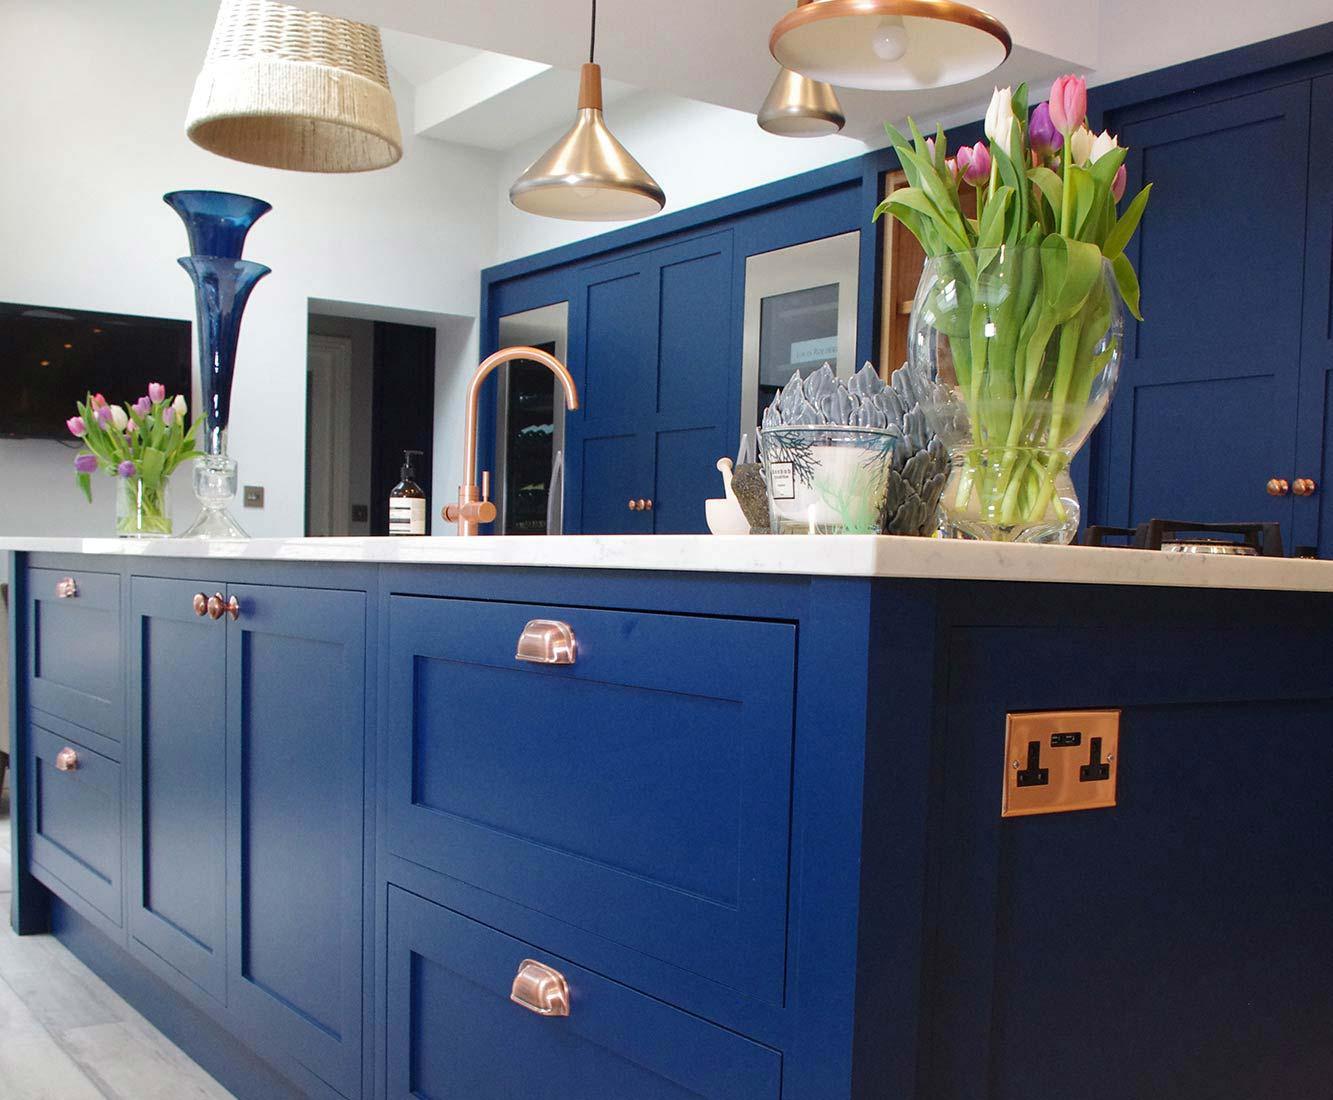 Frank-Anthony-Kitchens-Handbuilt-Handcrafted-Royal-Navy-Little-Greene-Blakelidge-Copper-Abode-Tap-2